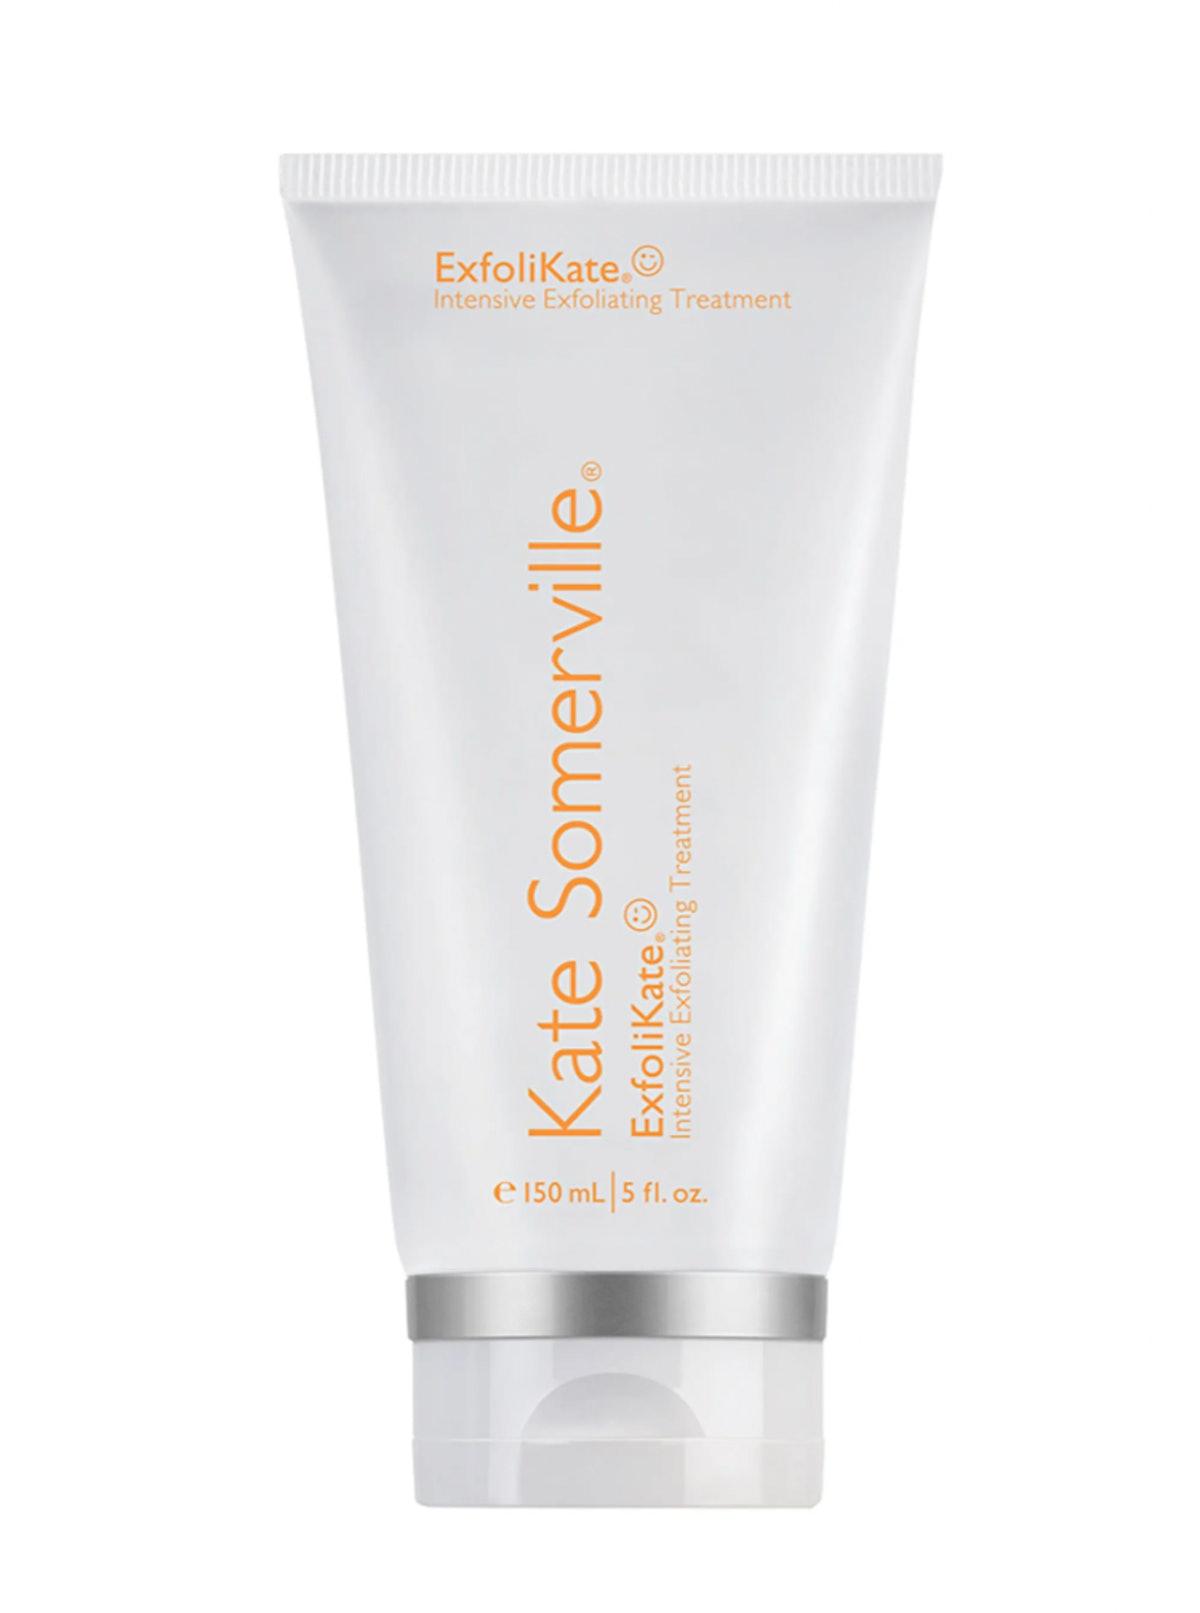 Kate Somerville Jumbo ExfoliKate® Intensive Exfoliating Treatment